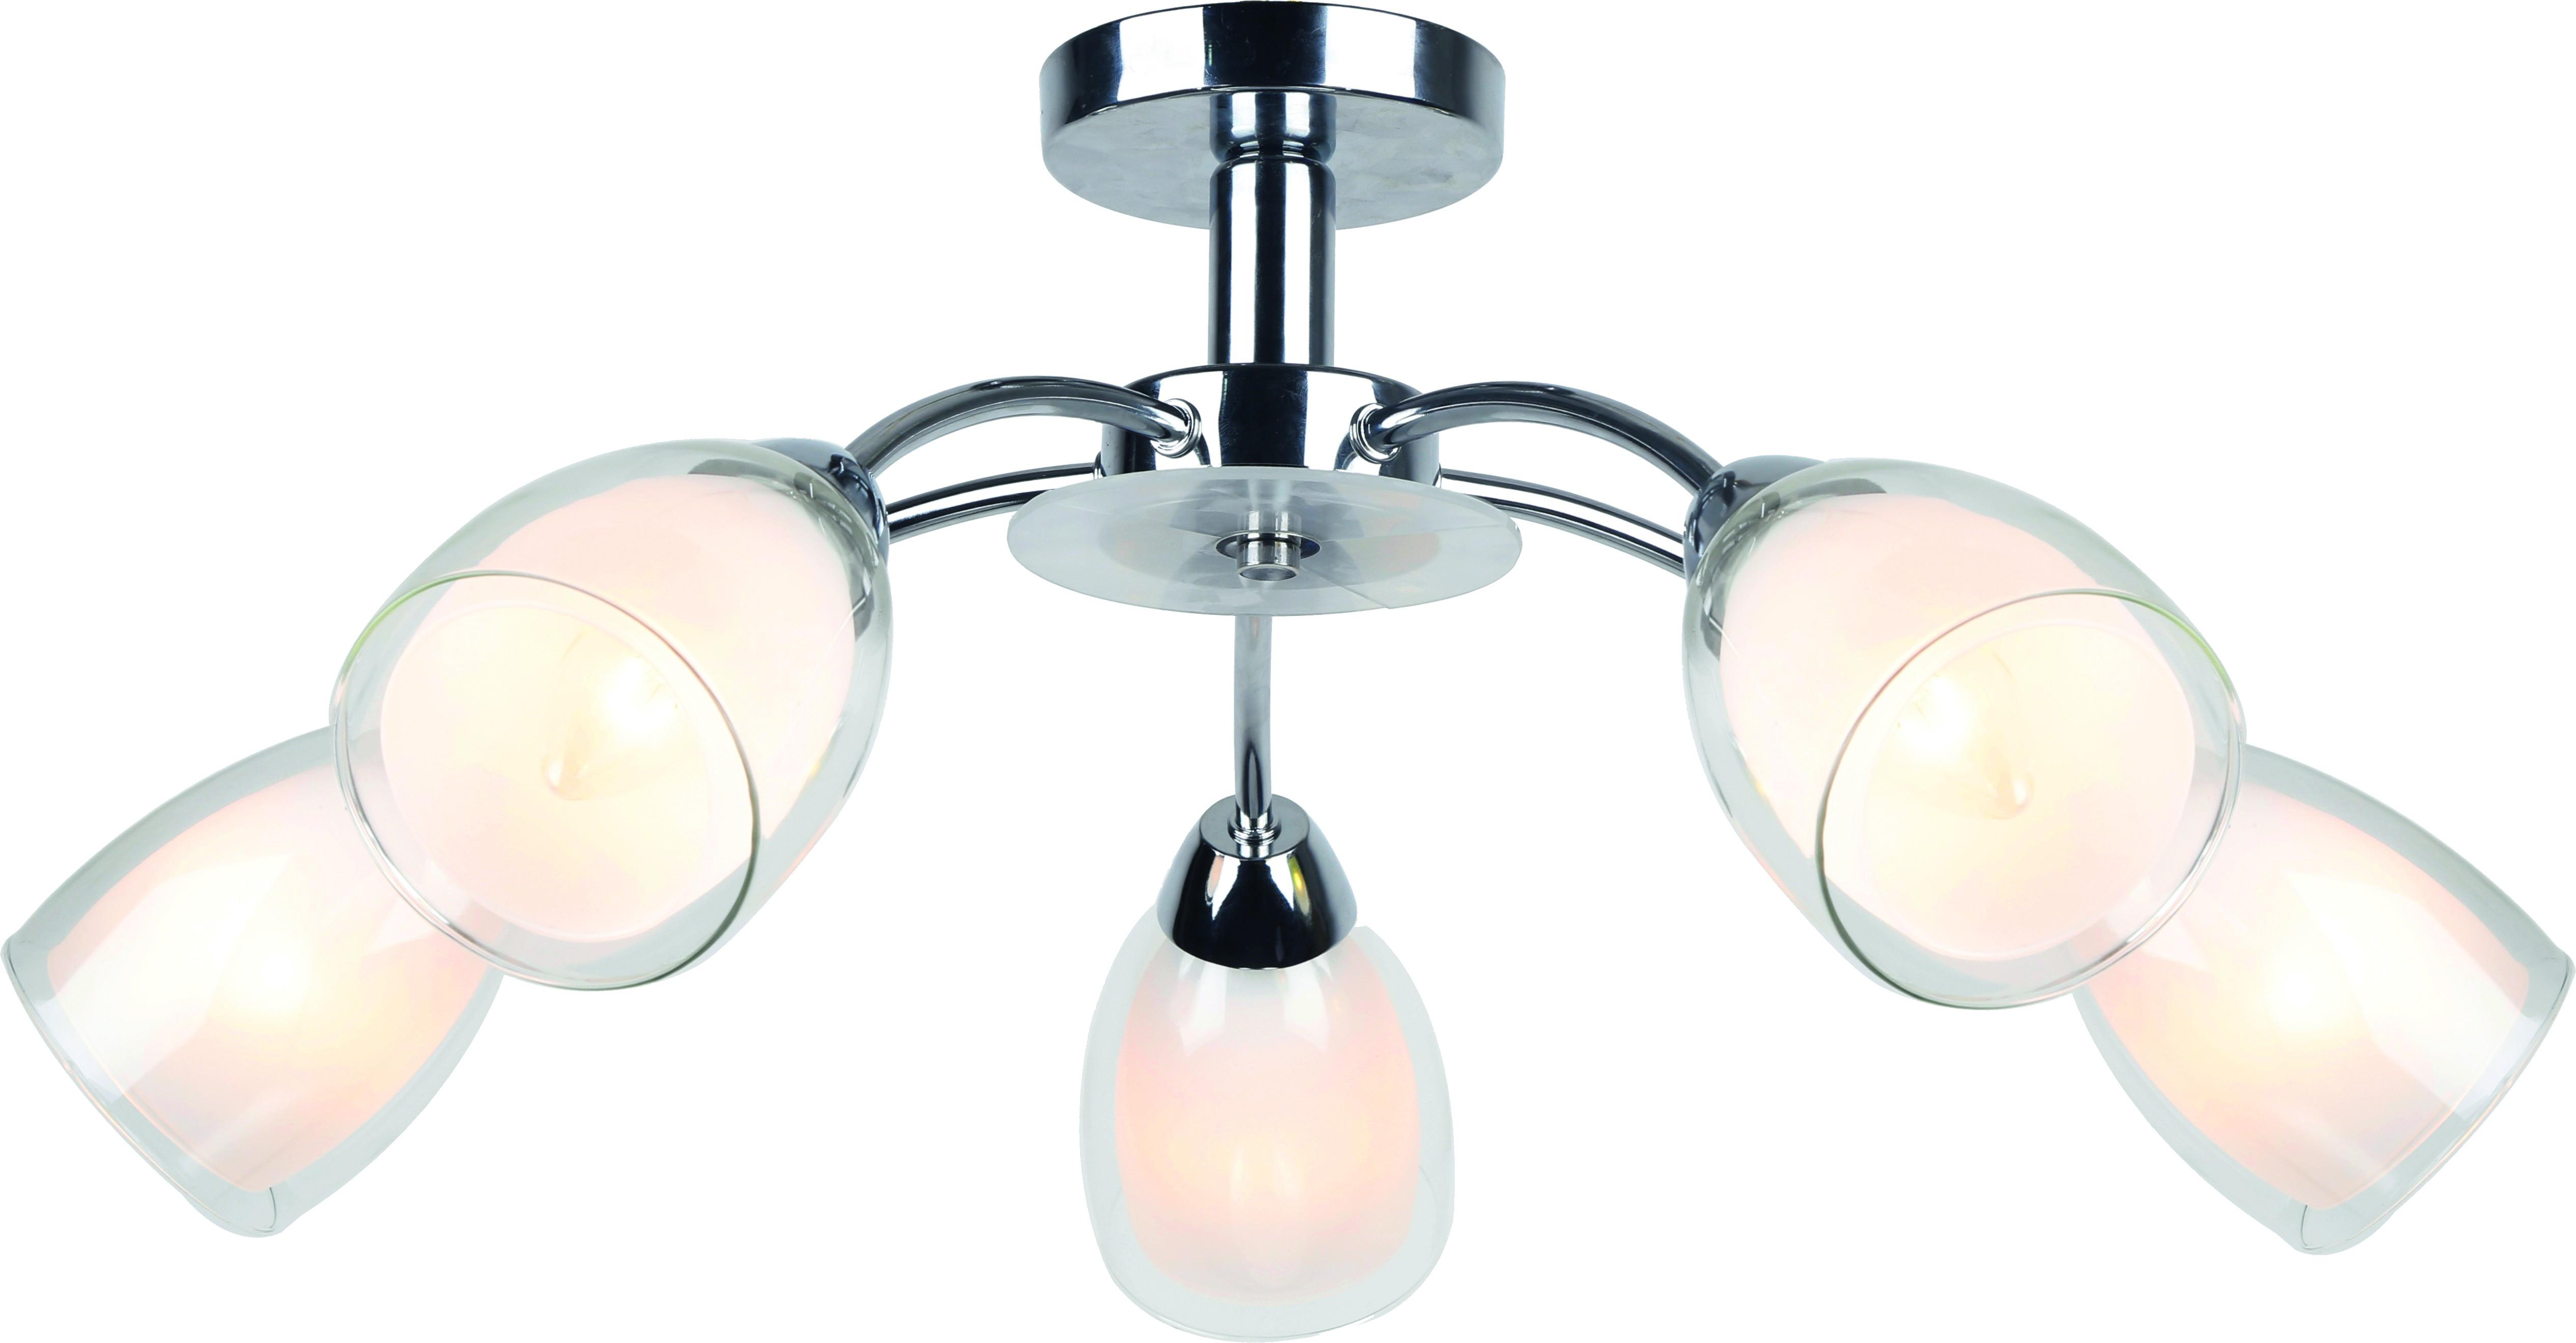 Люстра Arte lamp A7201pl-5cc люстра на штанге arte lamp carmela a7201pl 5cc